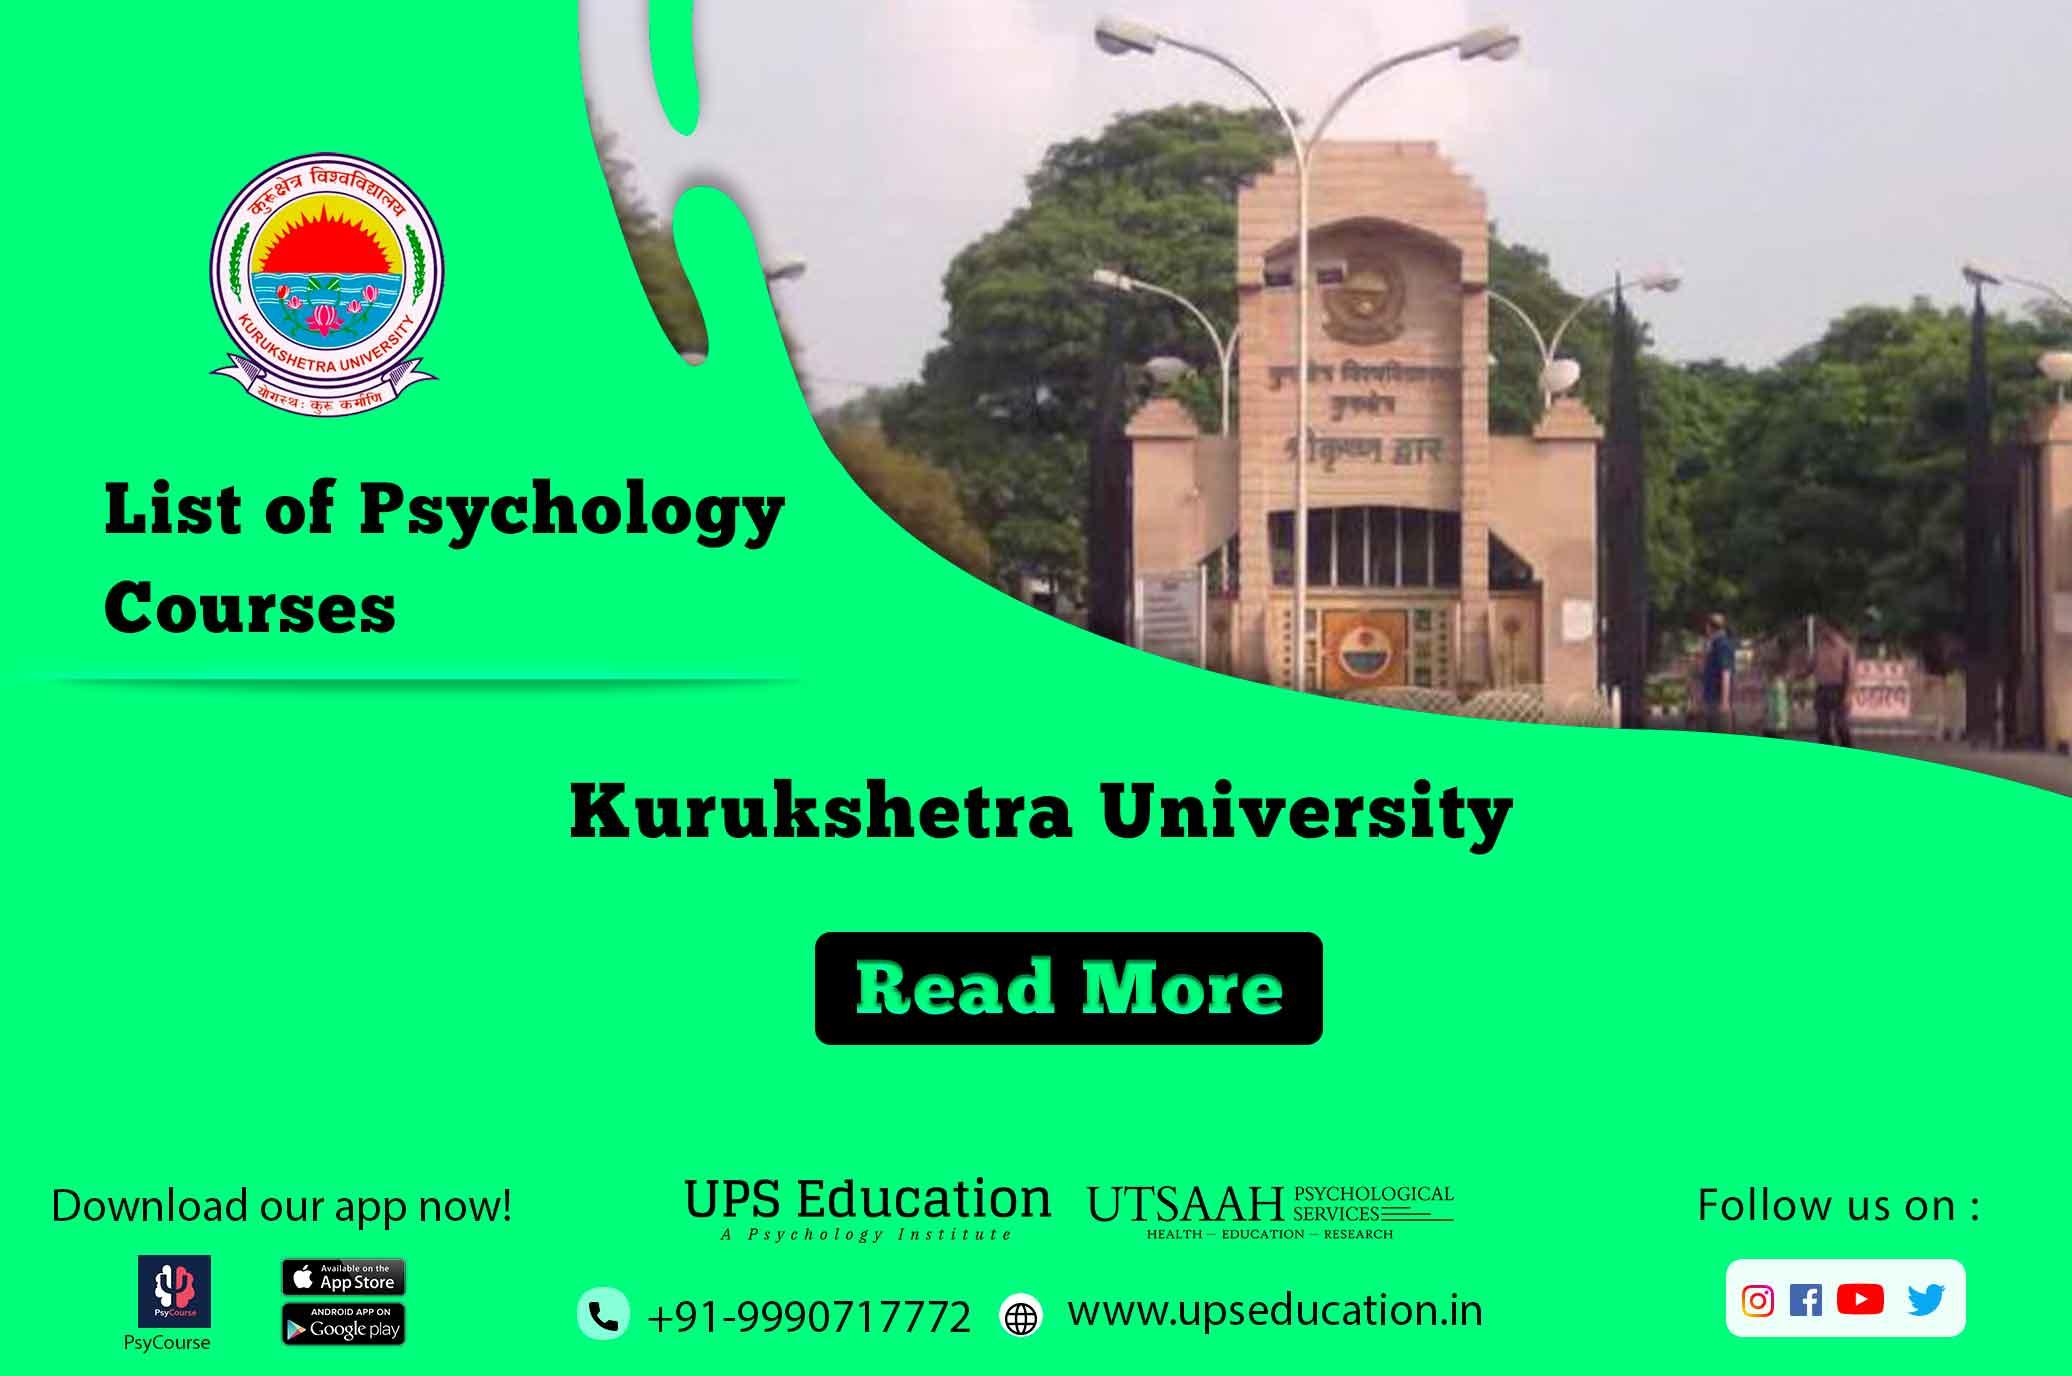 Kurukshetra Univesity List of Psychology Courses.